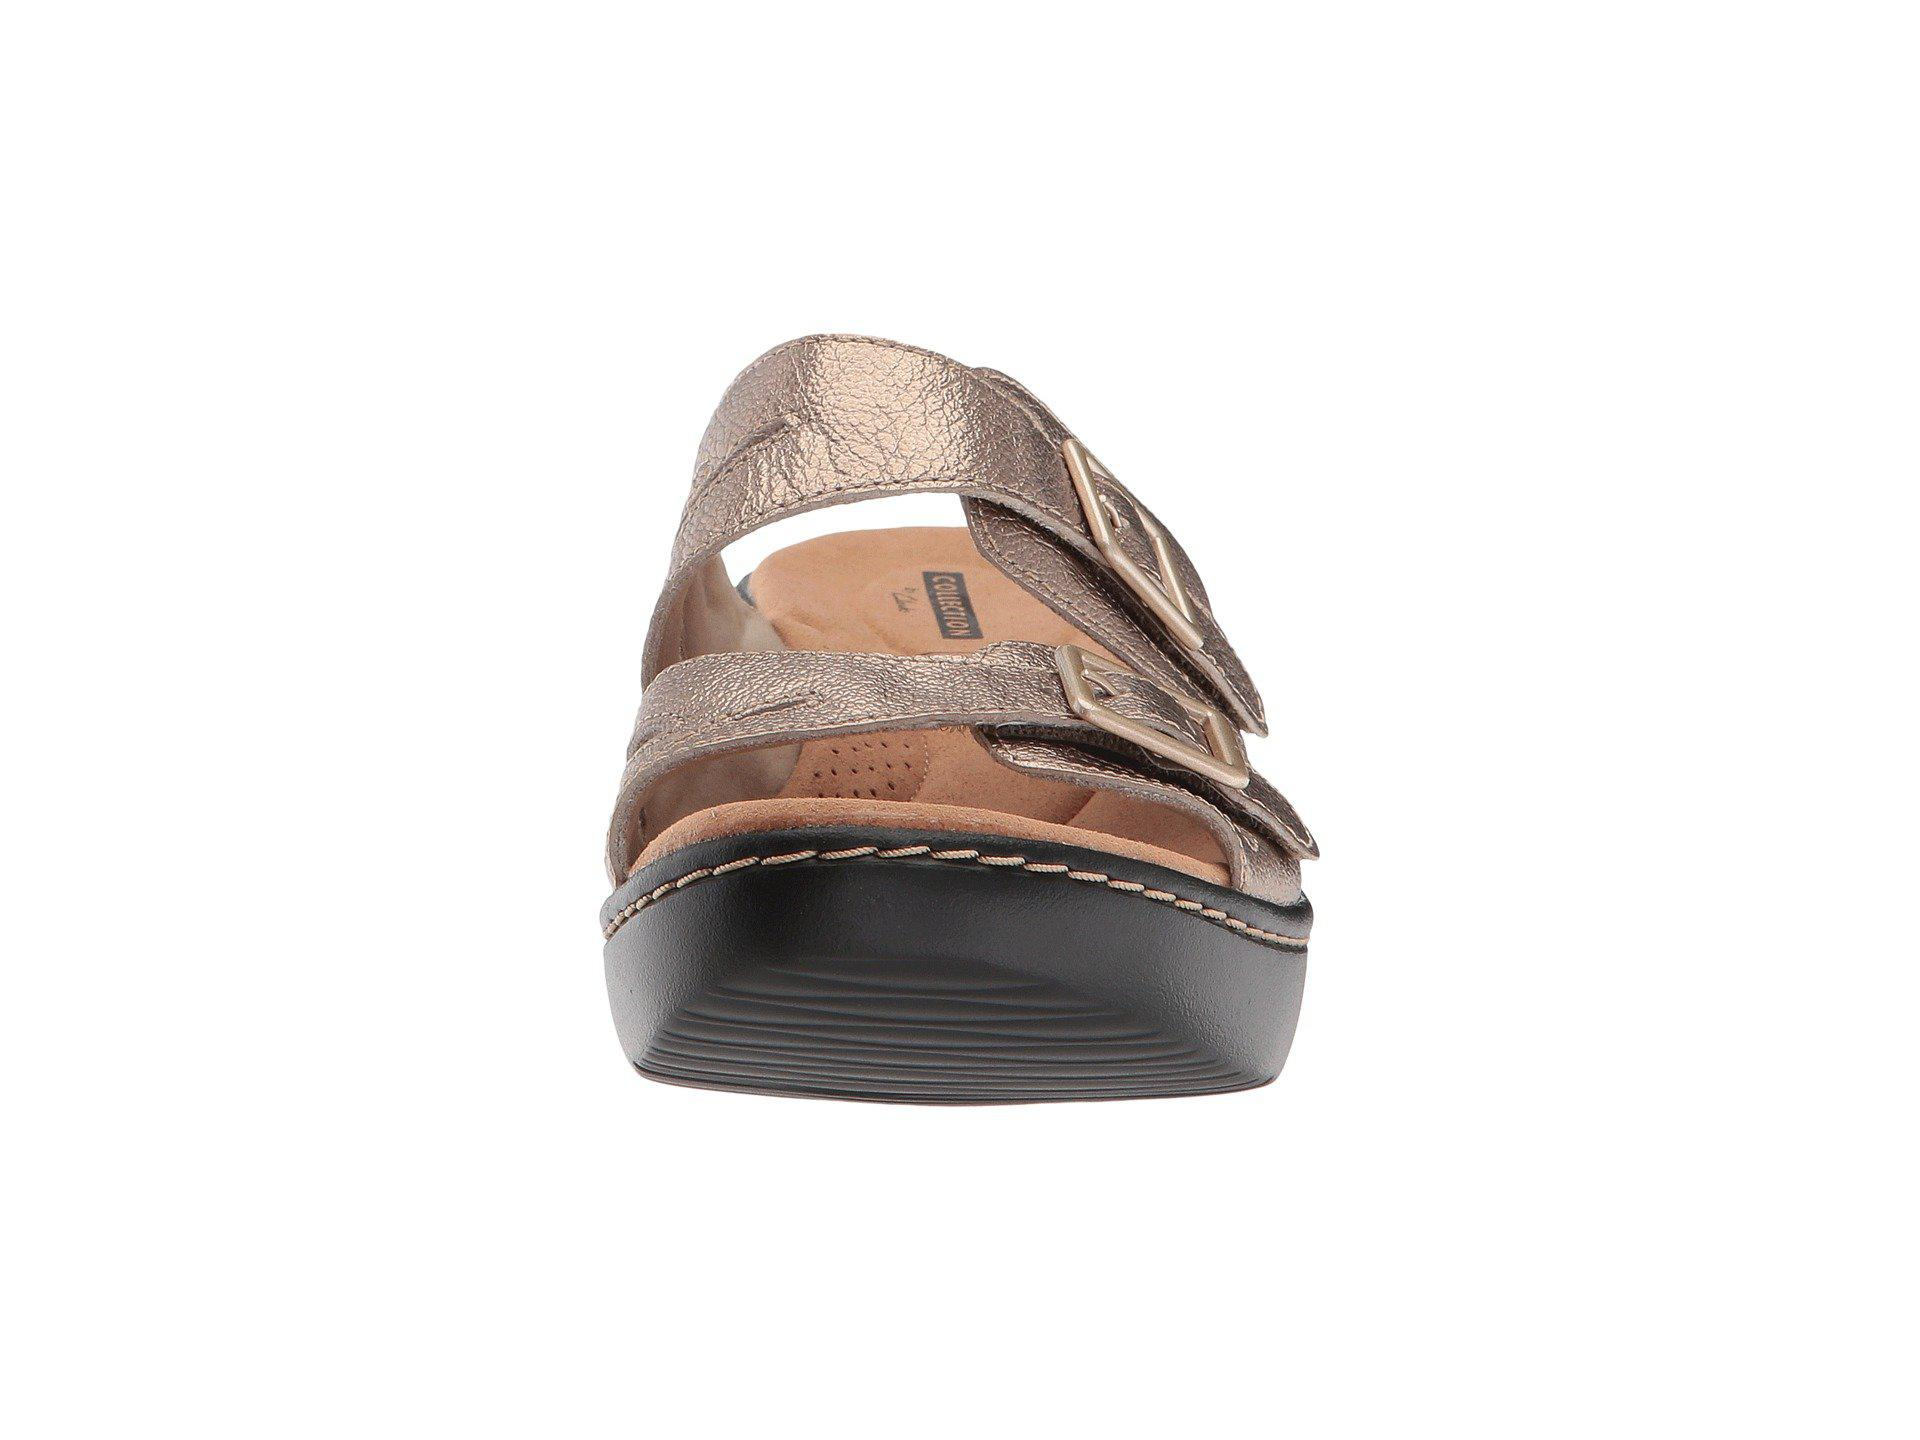 17633064d9a Clarks - Multicolor Delana Liri (dark Tan Leather) Women s Shoes - Lyst.  View fullscreen